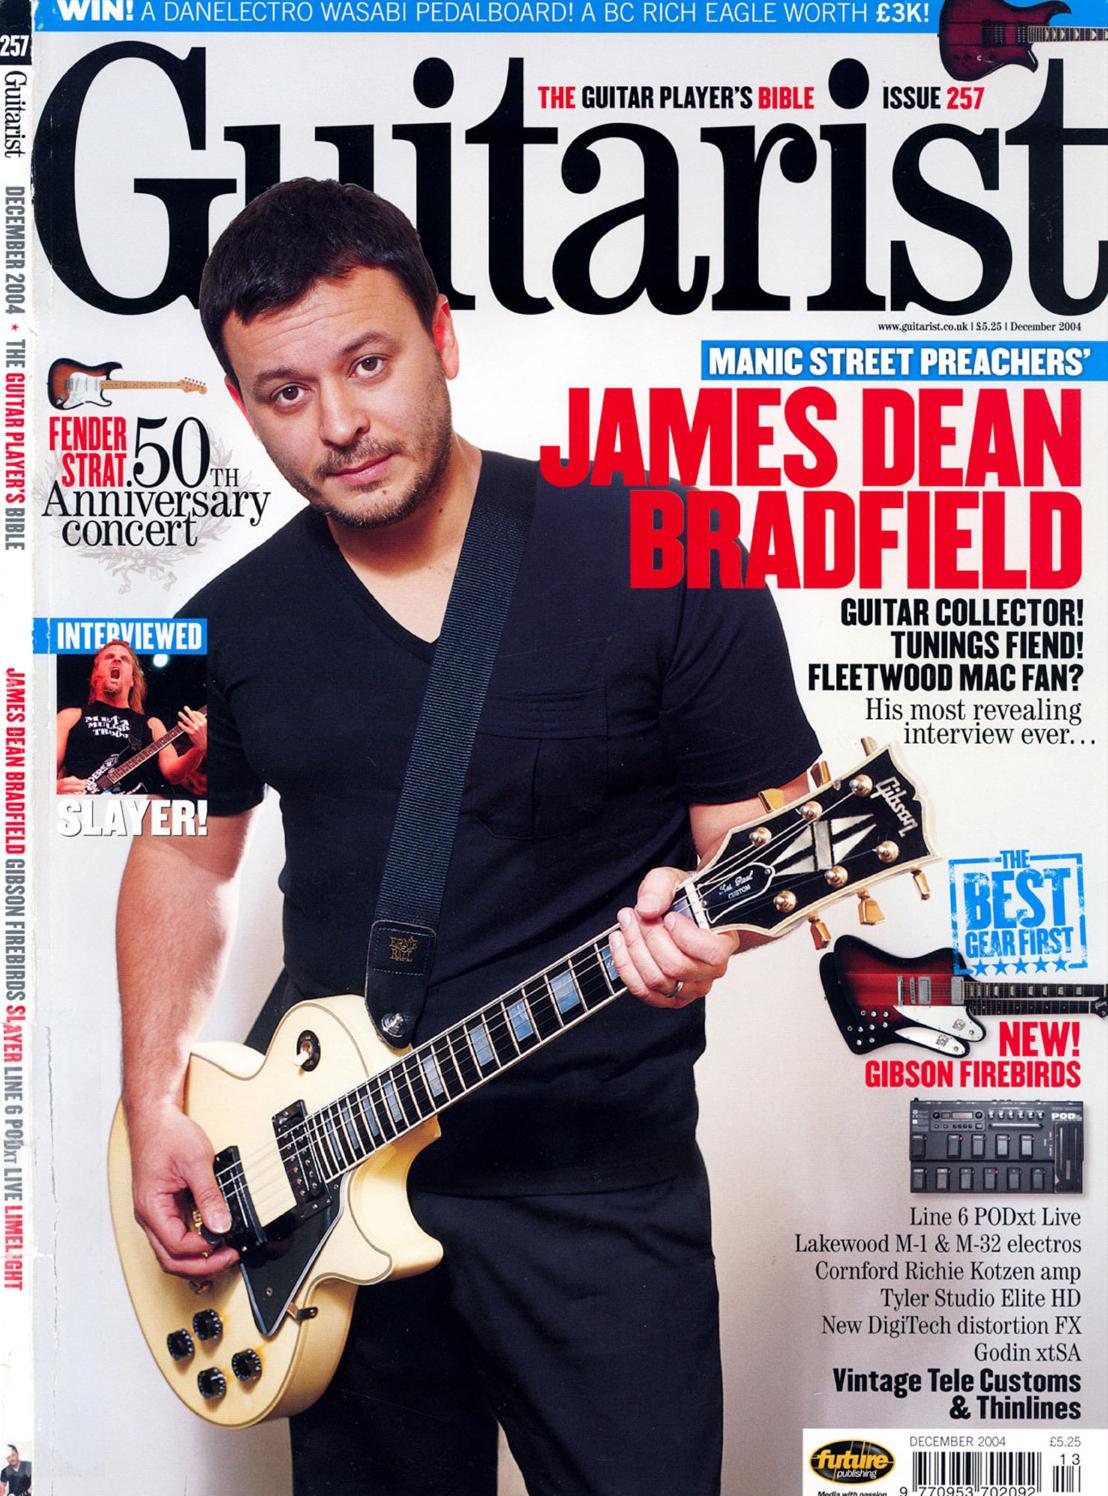 Copy of 2004 Guitarist